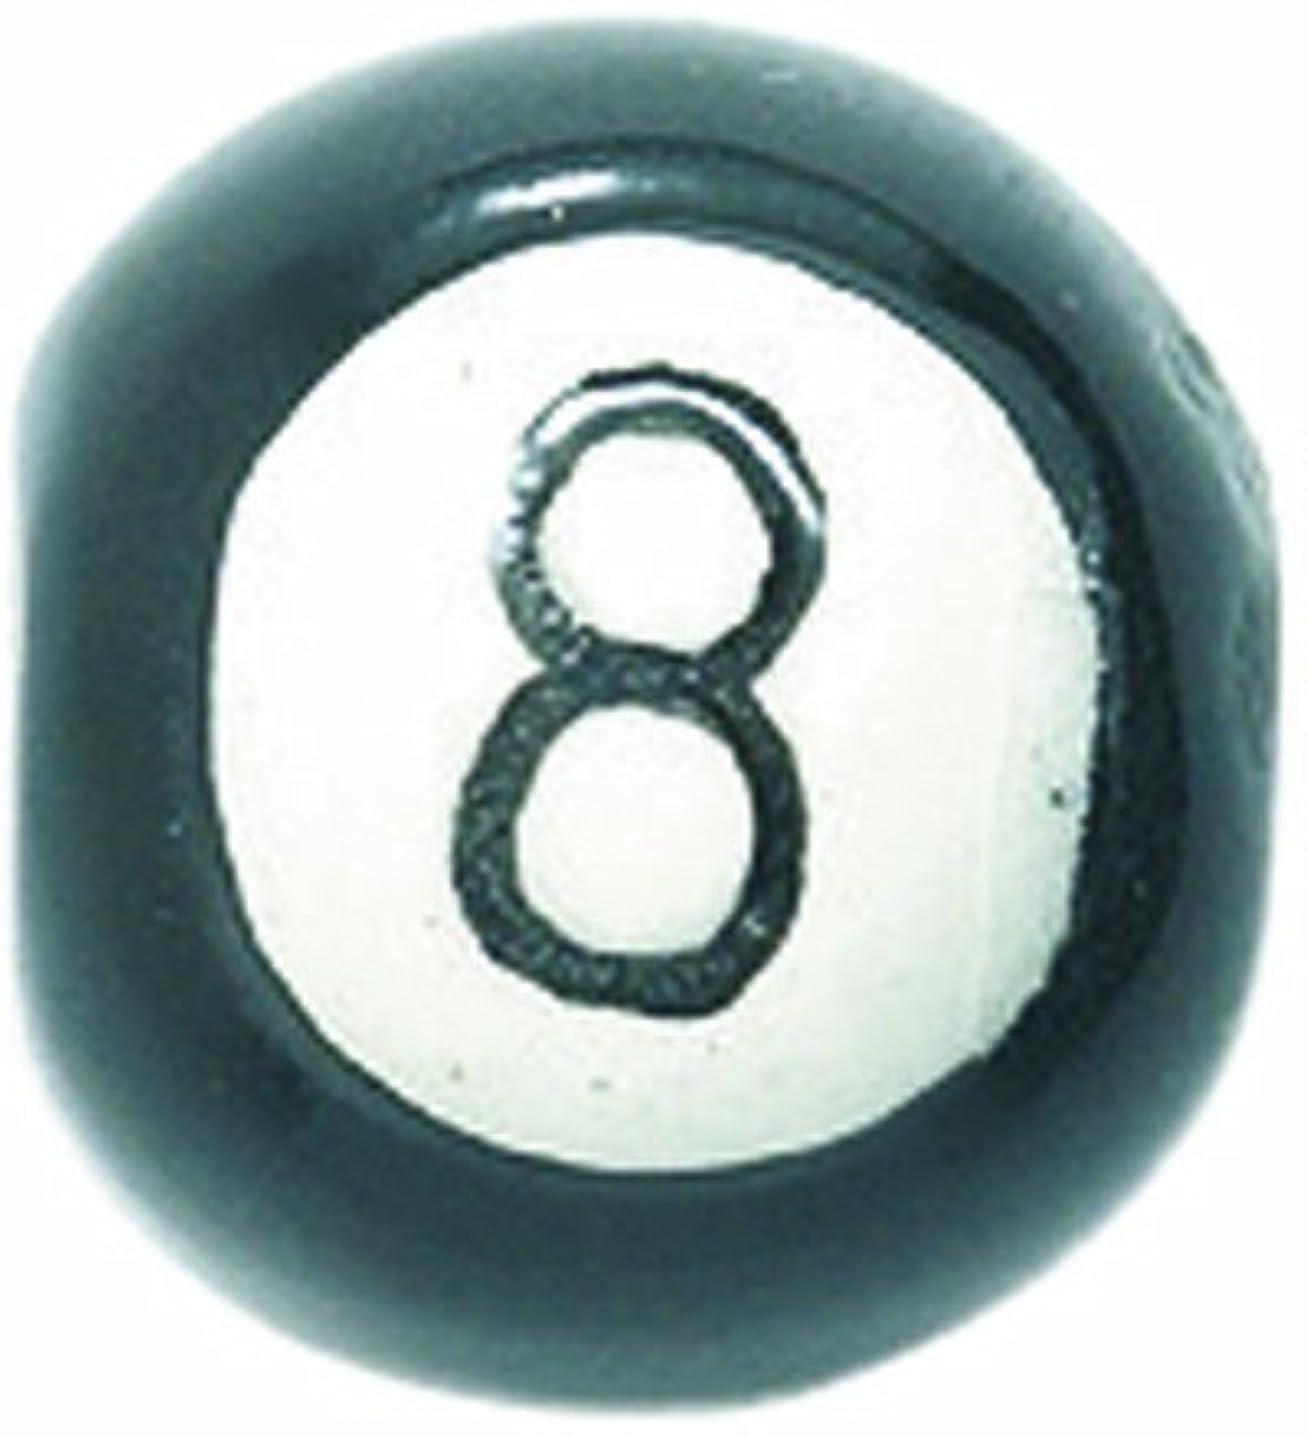 Shipwreck Beads 12mm Peruvian Hand Crafted Ceramic 8 Ball Beads, Black, 8 per Pack